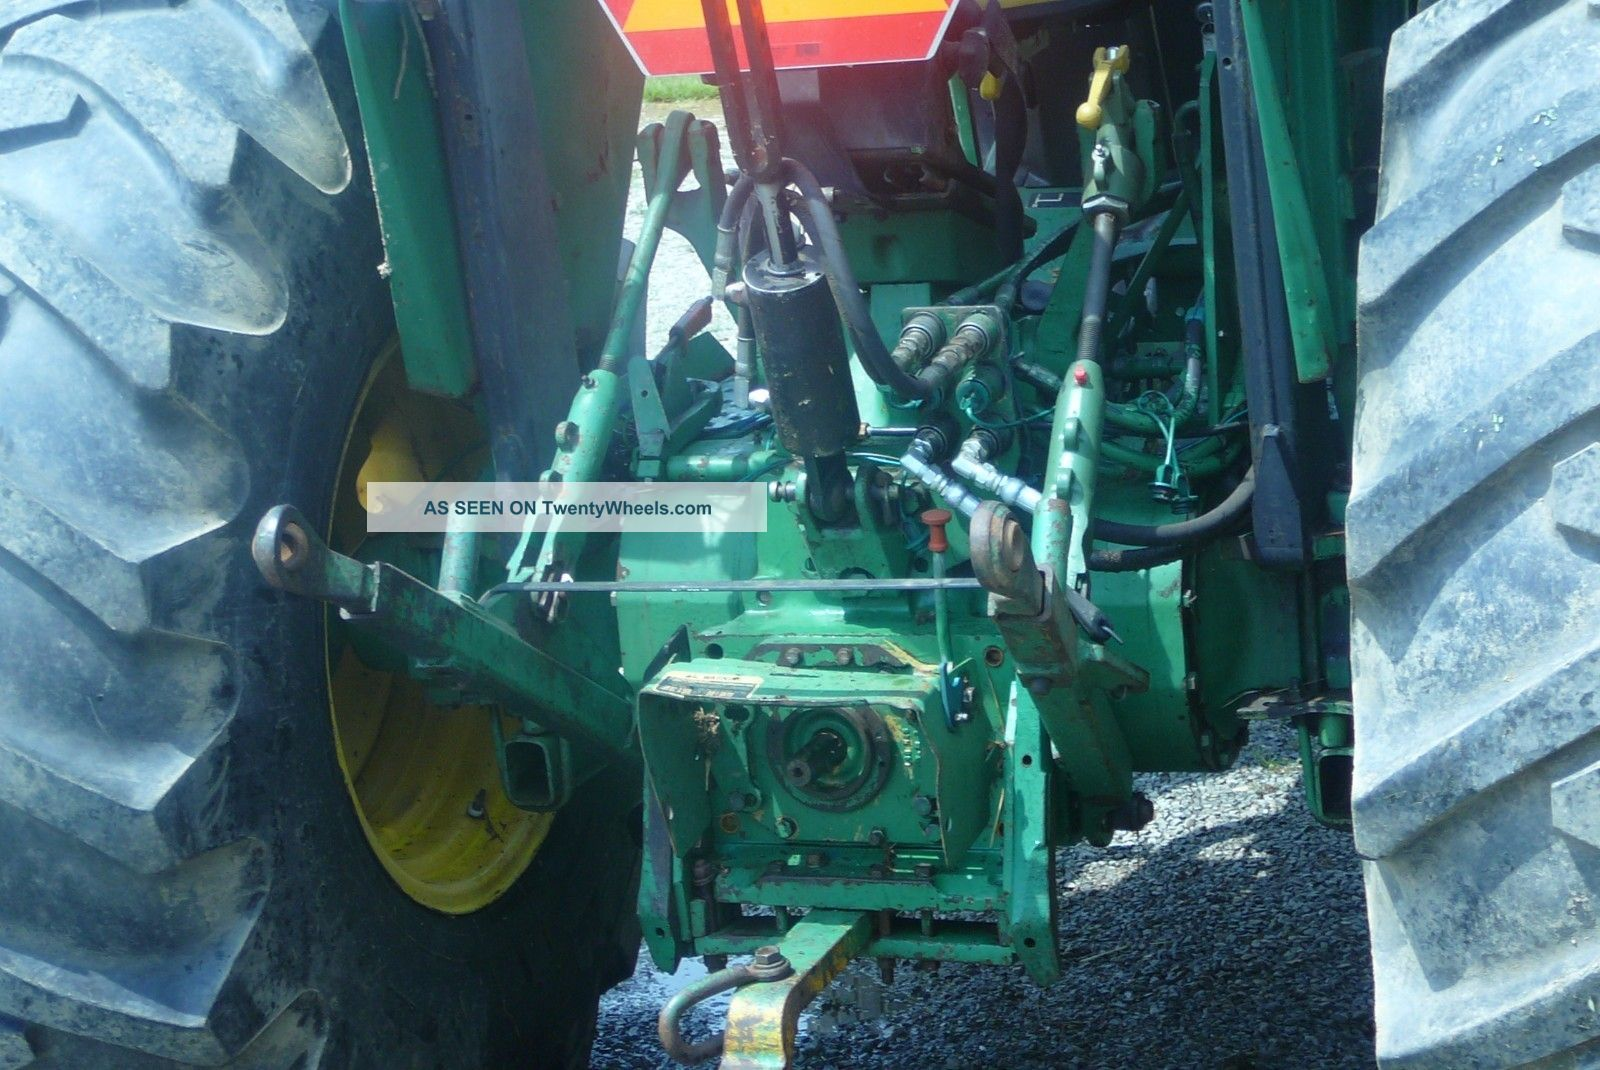 John Deere 245 Excavator Specs : John deere  ser l g w nsl loader